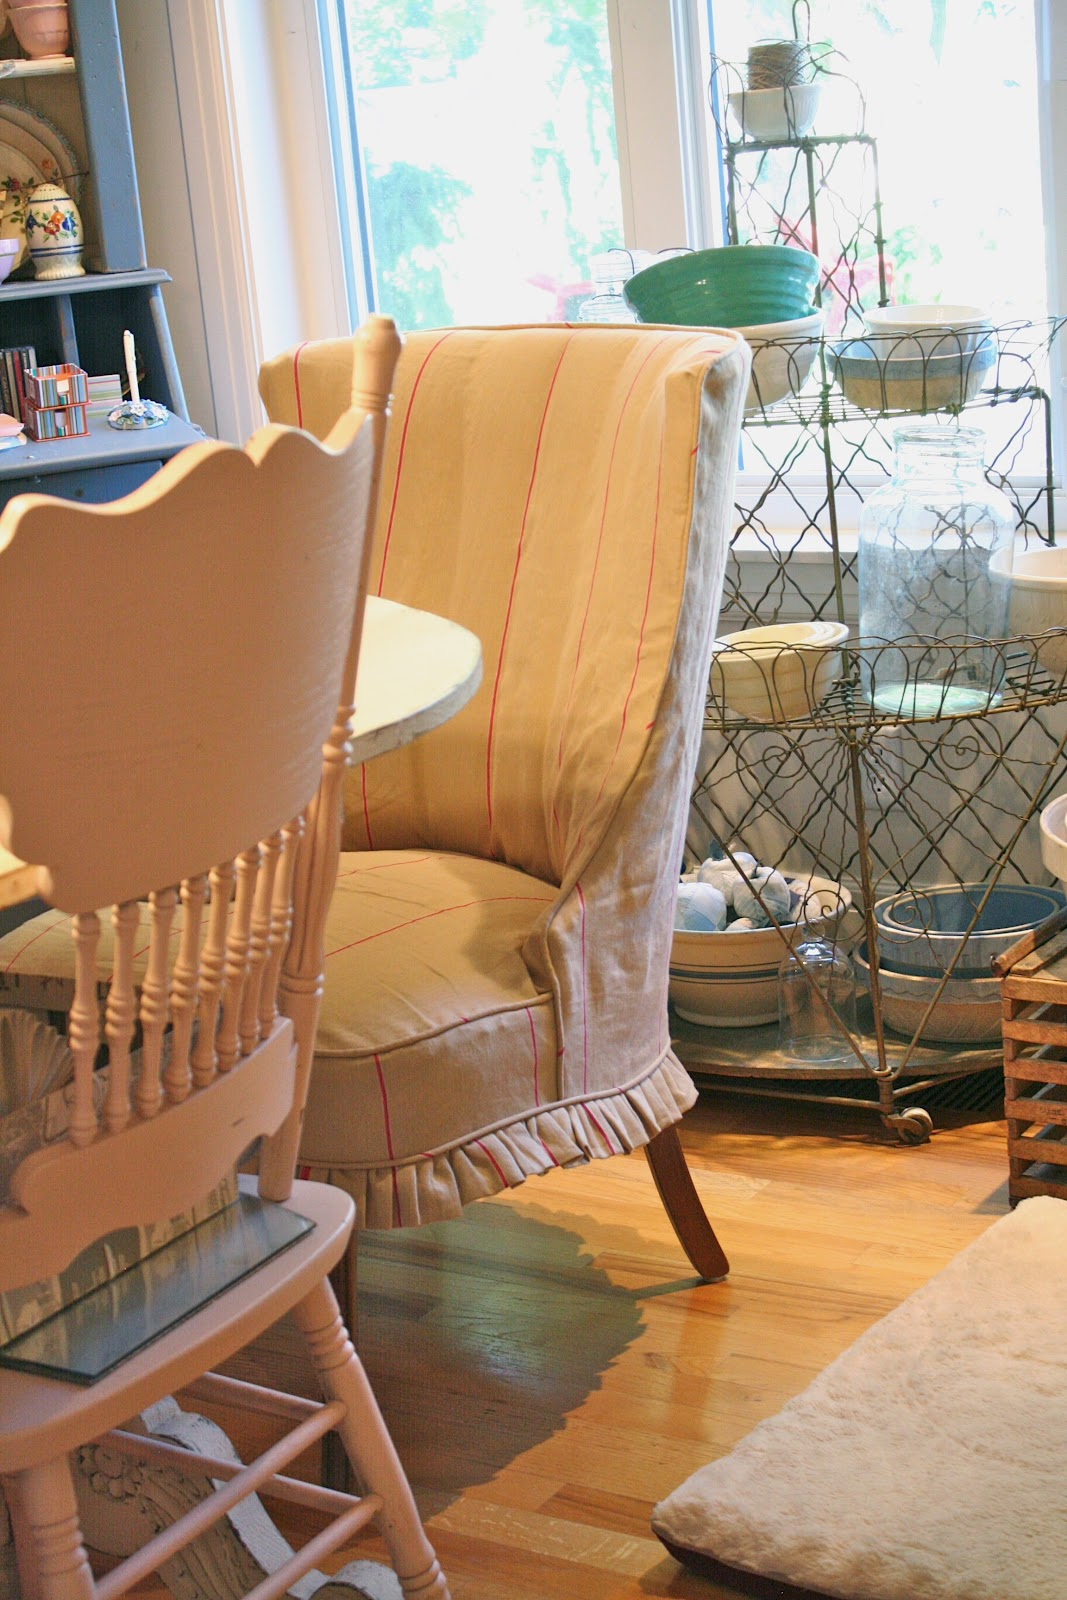 Custom Dining Chair Slipcovers Navy Slipper By Shelley Slipcovered Host And Hostess